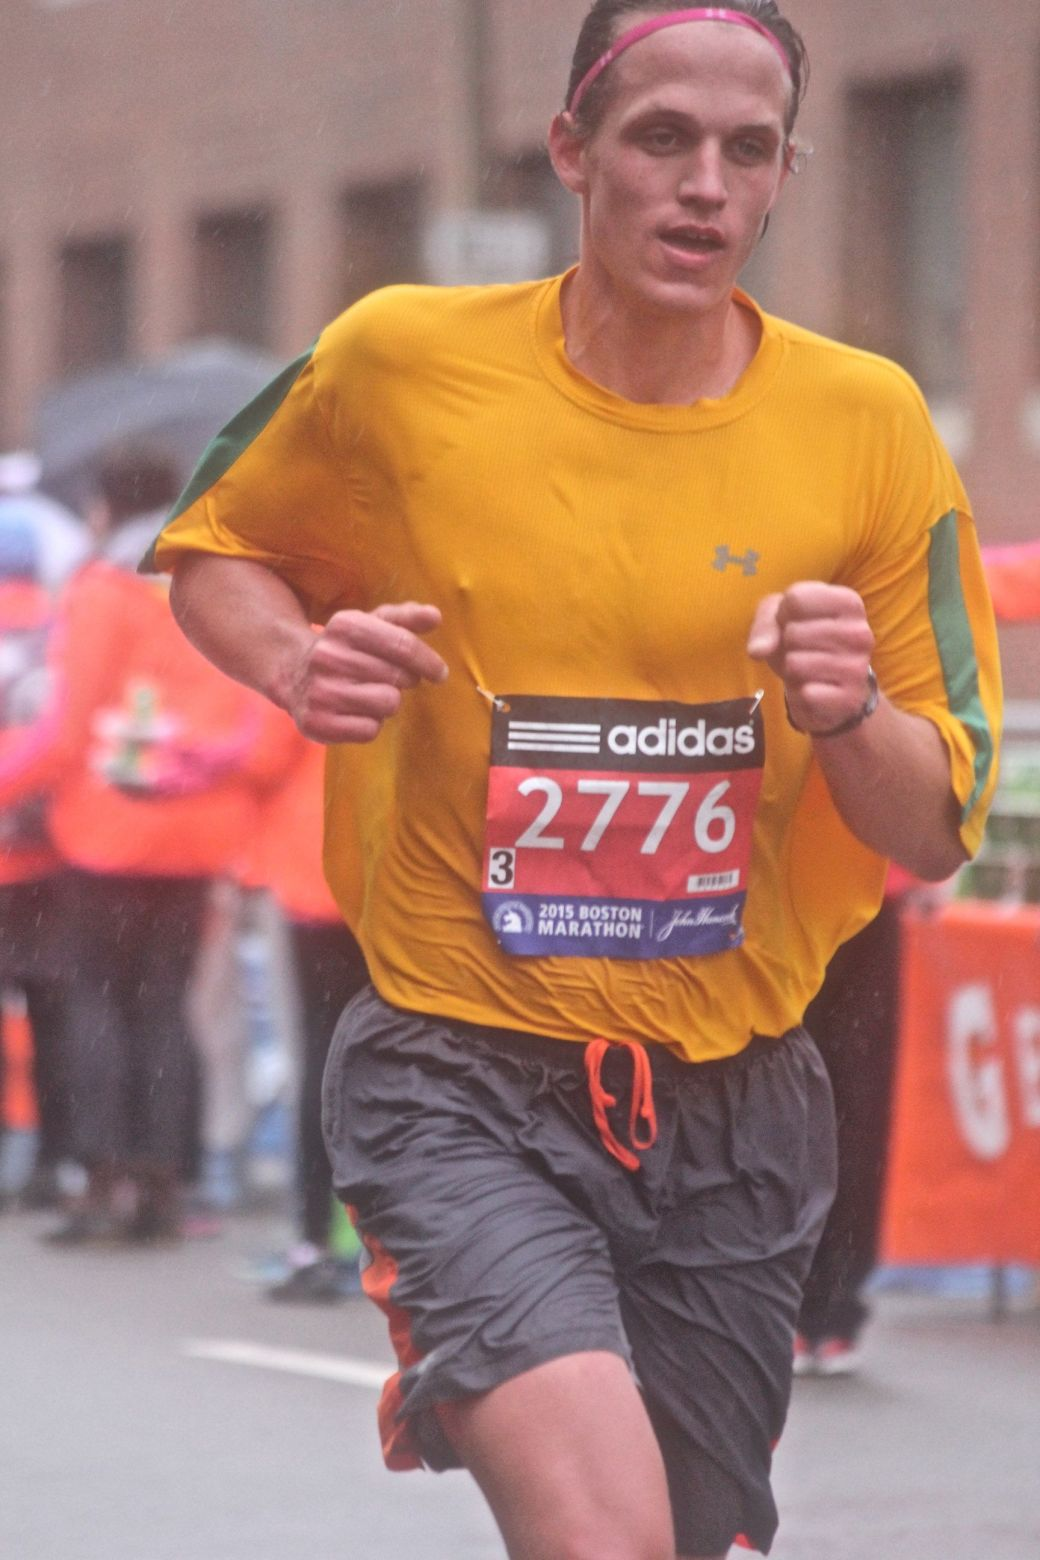 boston marathon april 20 2015 racer number 2776